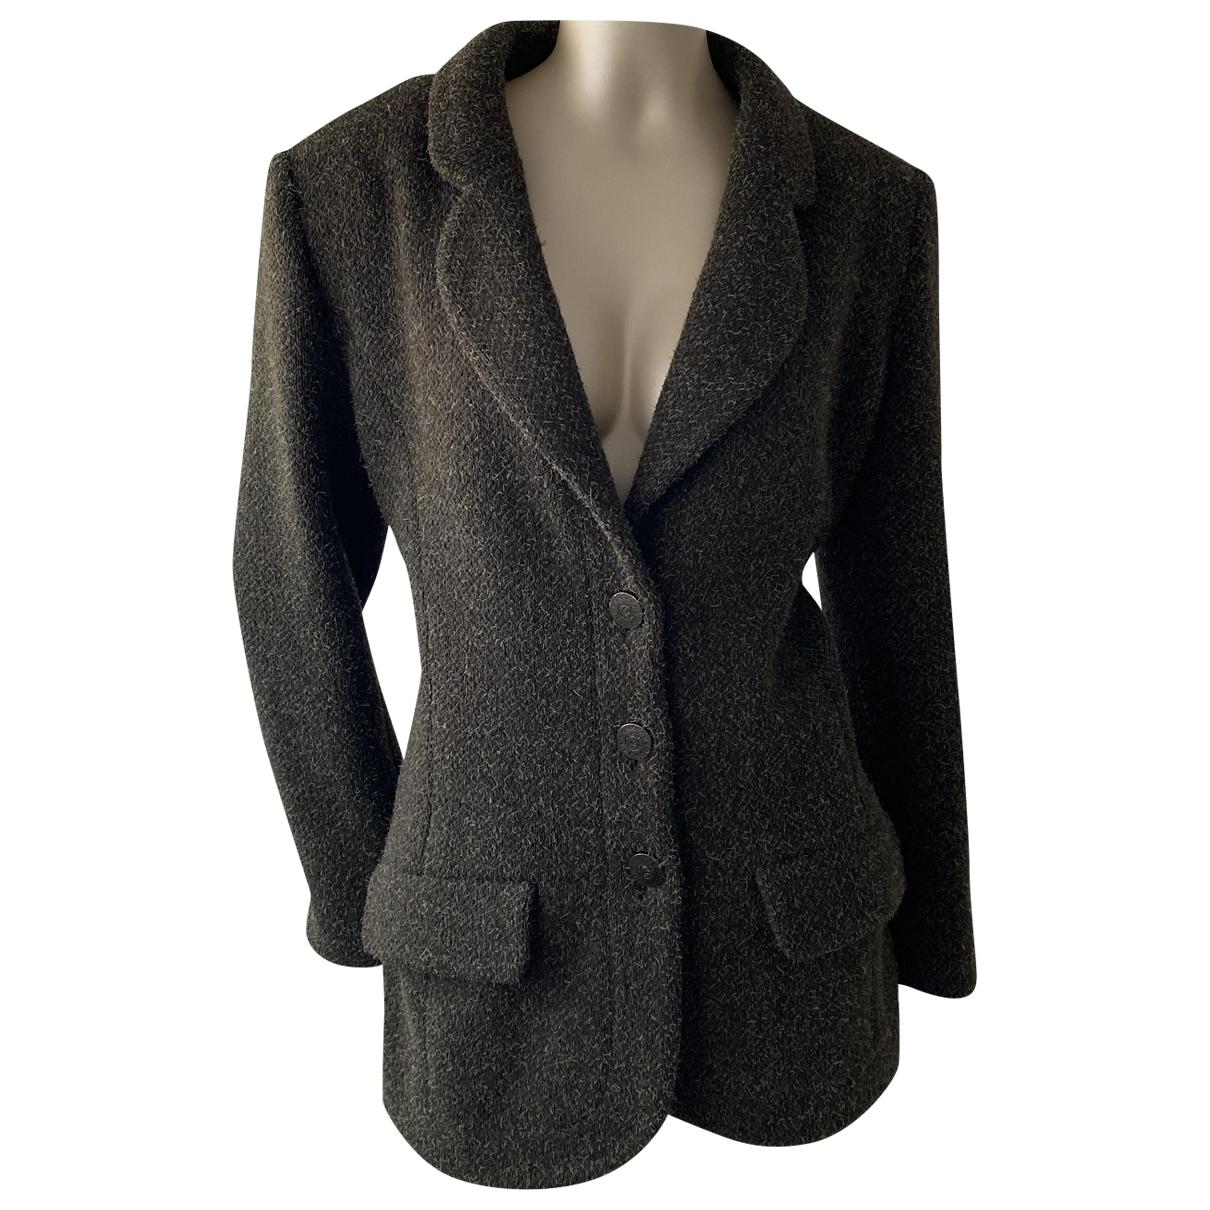 Chanel \N Khaki jacket for Women 42 FR